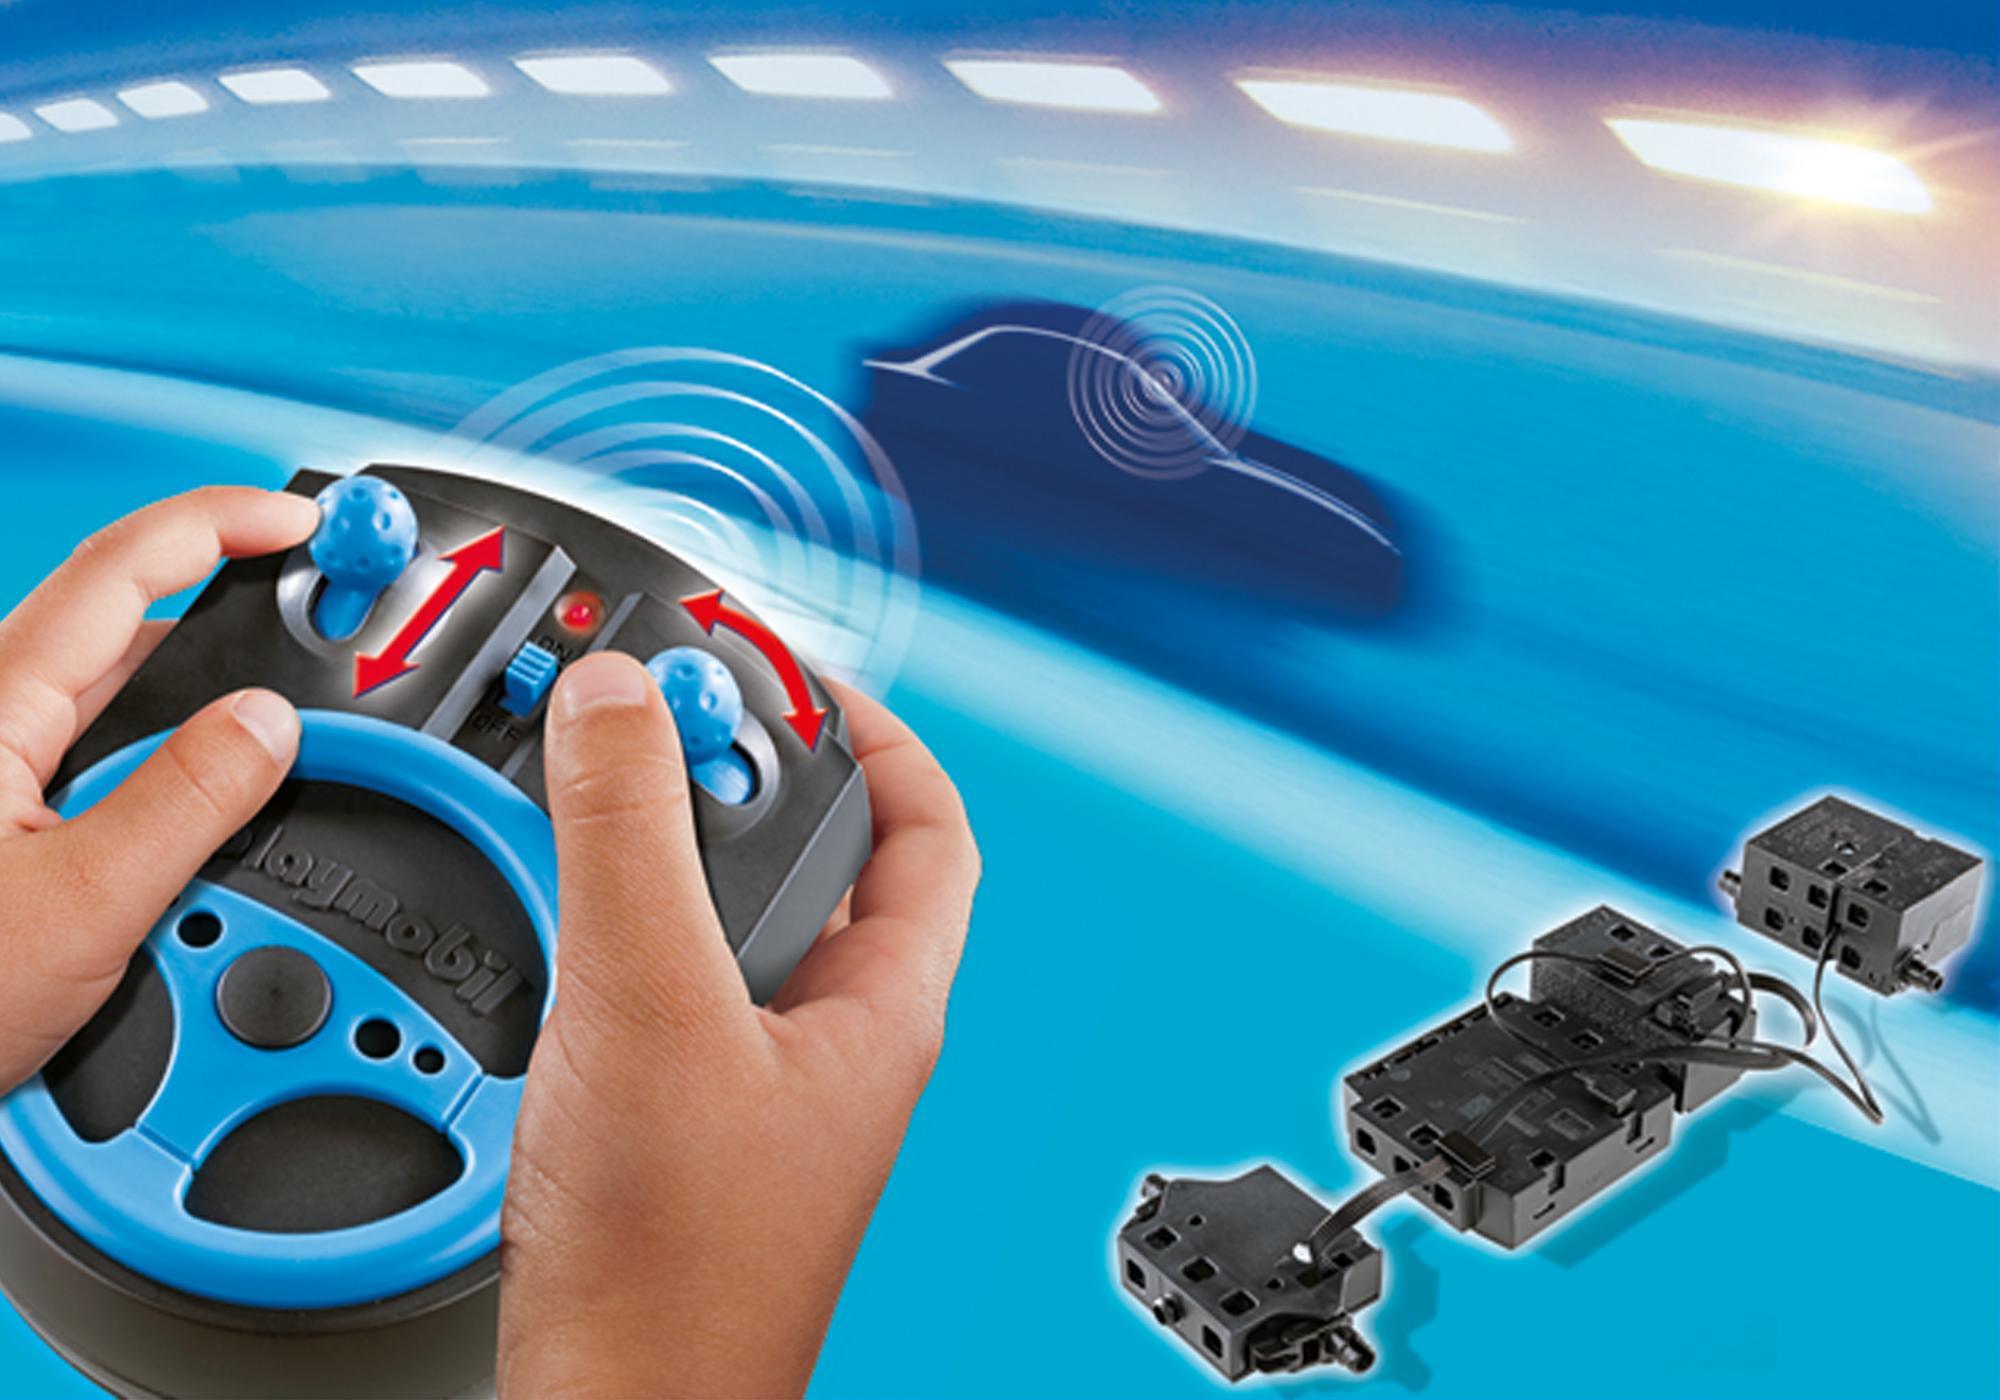 http://media.playmobil.com/i/playmobil/6914_product_extra1/Module de radiocommande 2,4 GHz